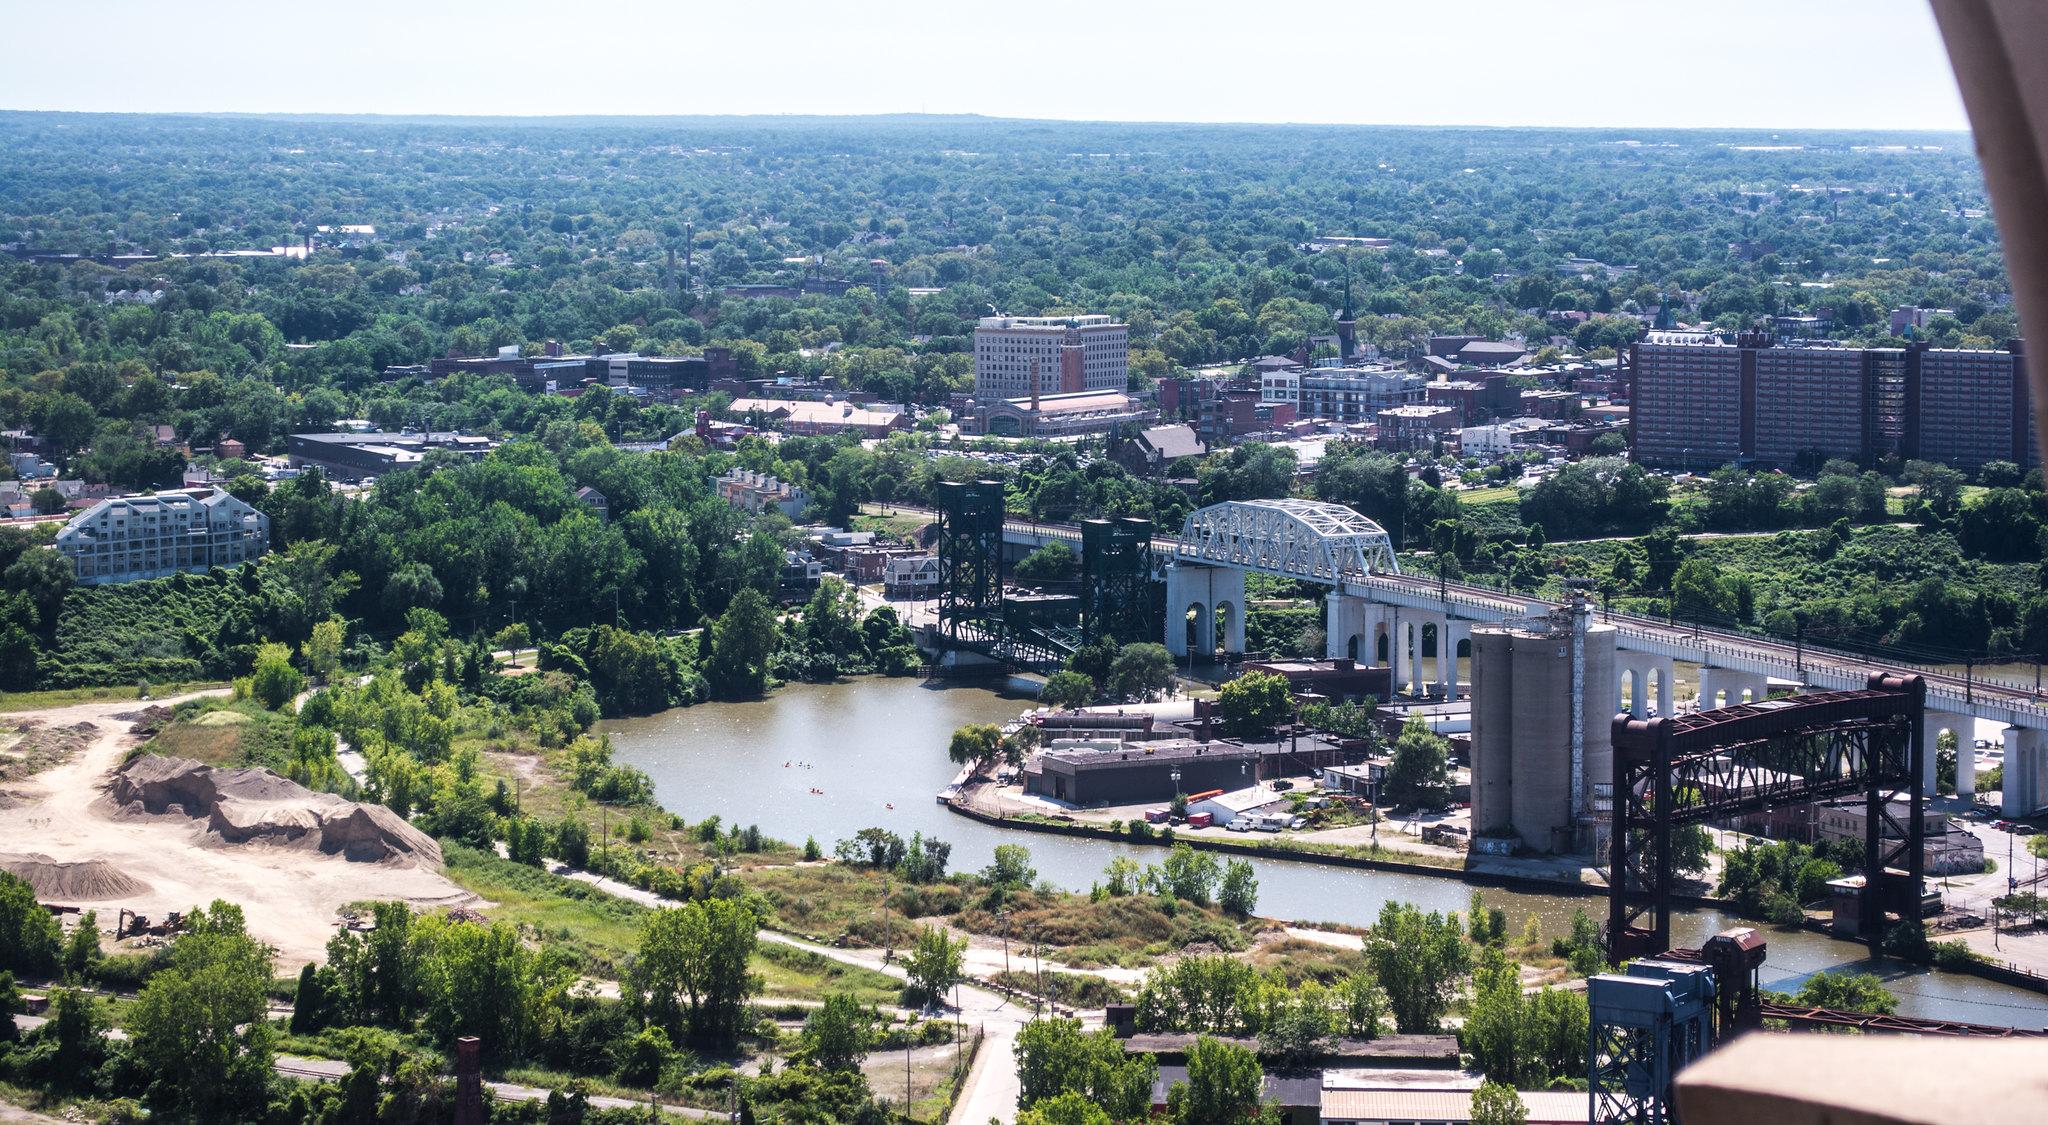 Scranton Flats - Irishtown Bend - Cuyahoga Viaduct 02 - Cleveland Ohio